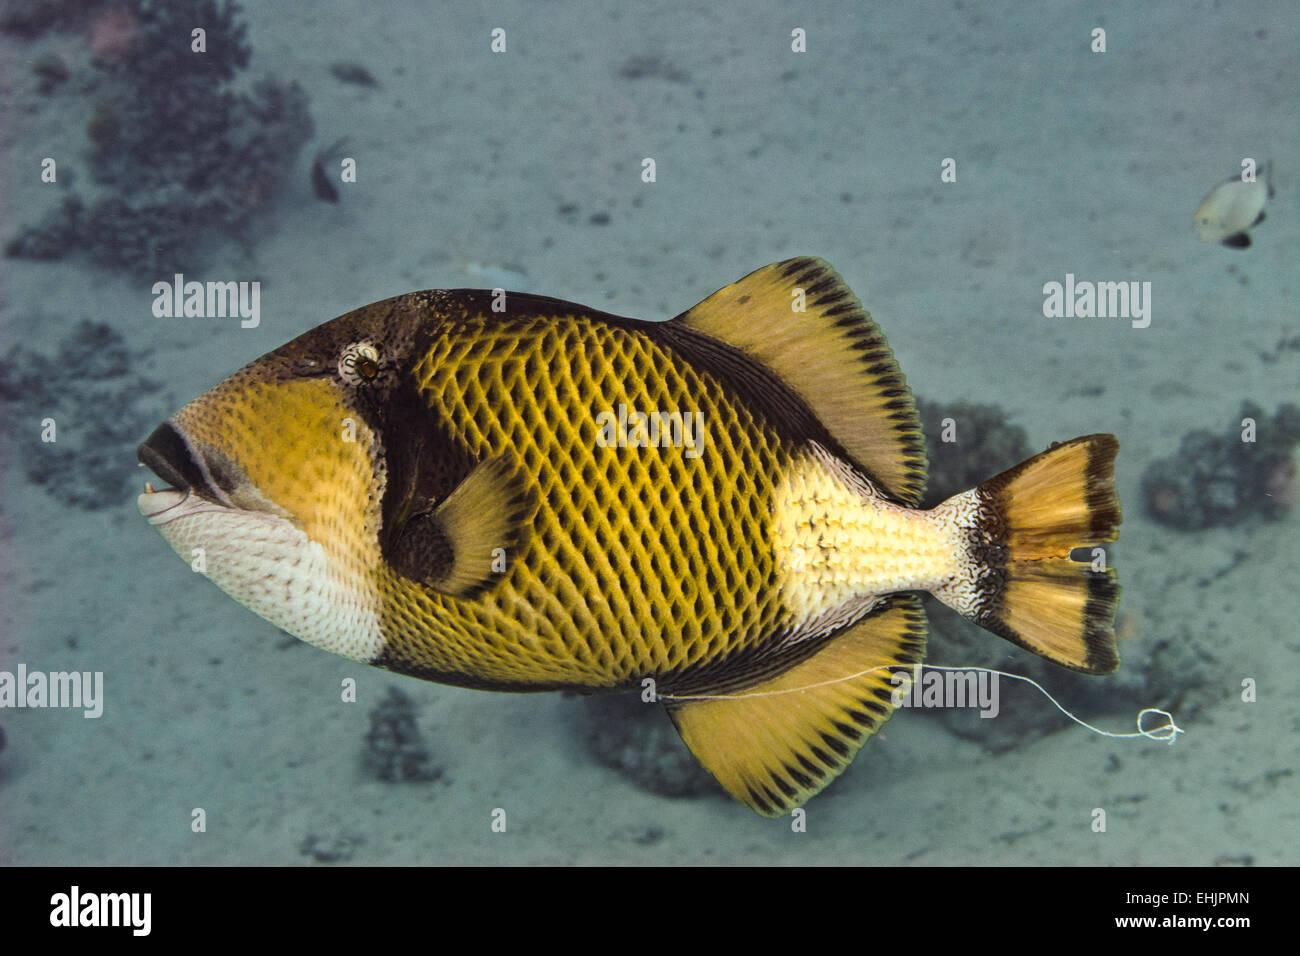 Titan triggerfish - Stock Image